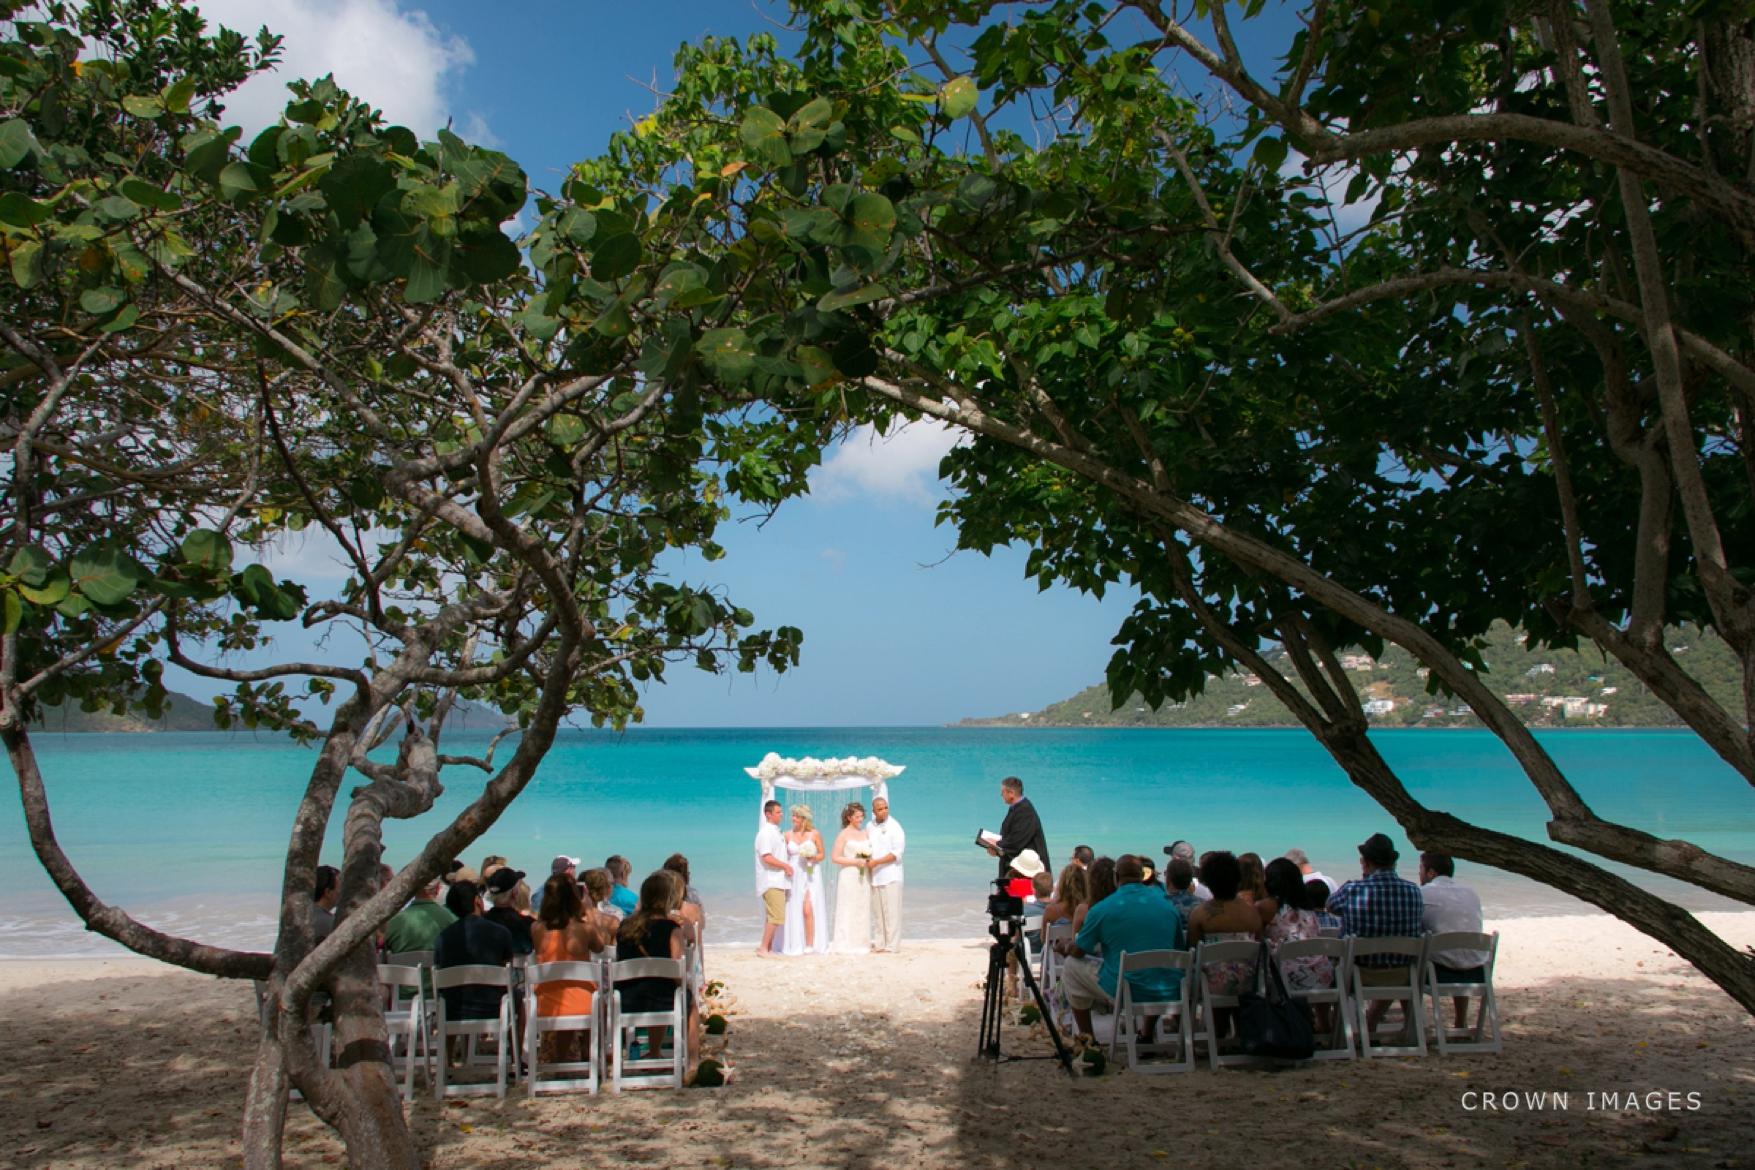 wedding_photos_saint_thomas_crown_images_0559.jpg